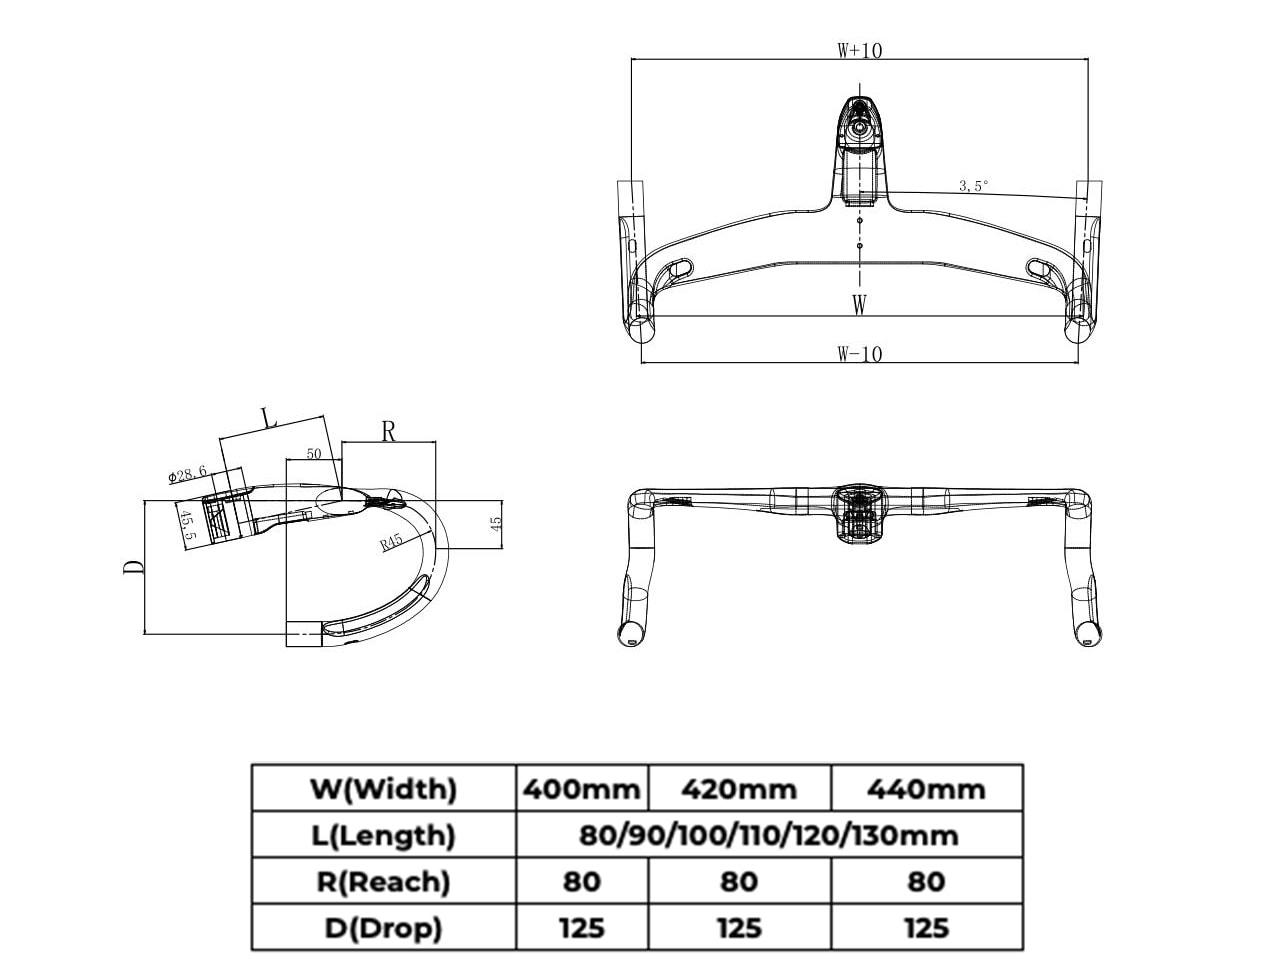 gravel integrated handlebar geometry